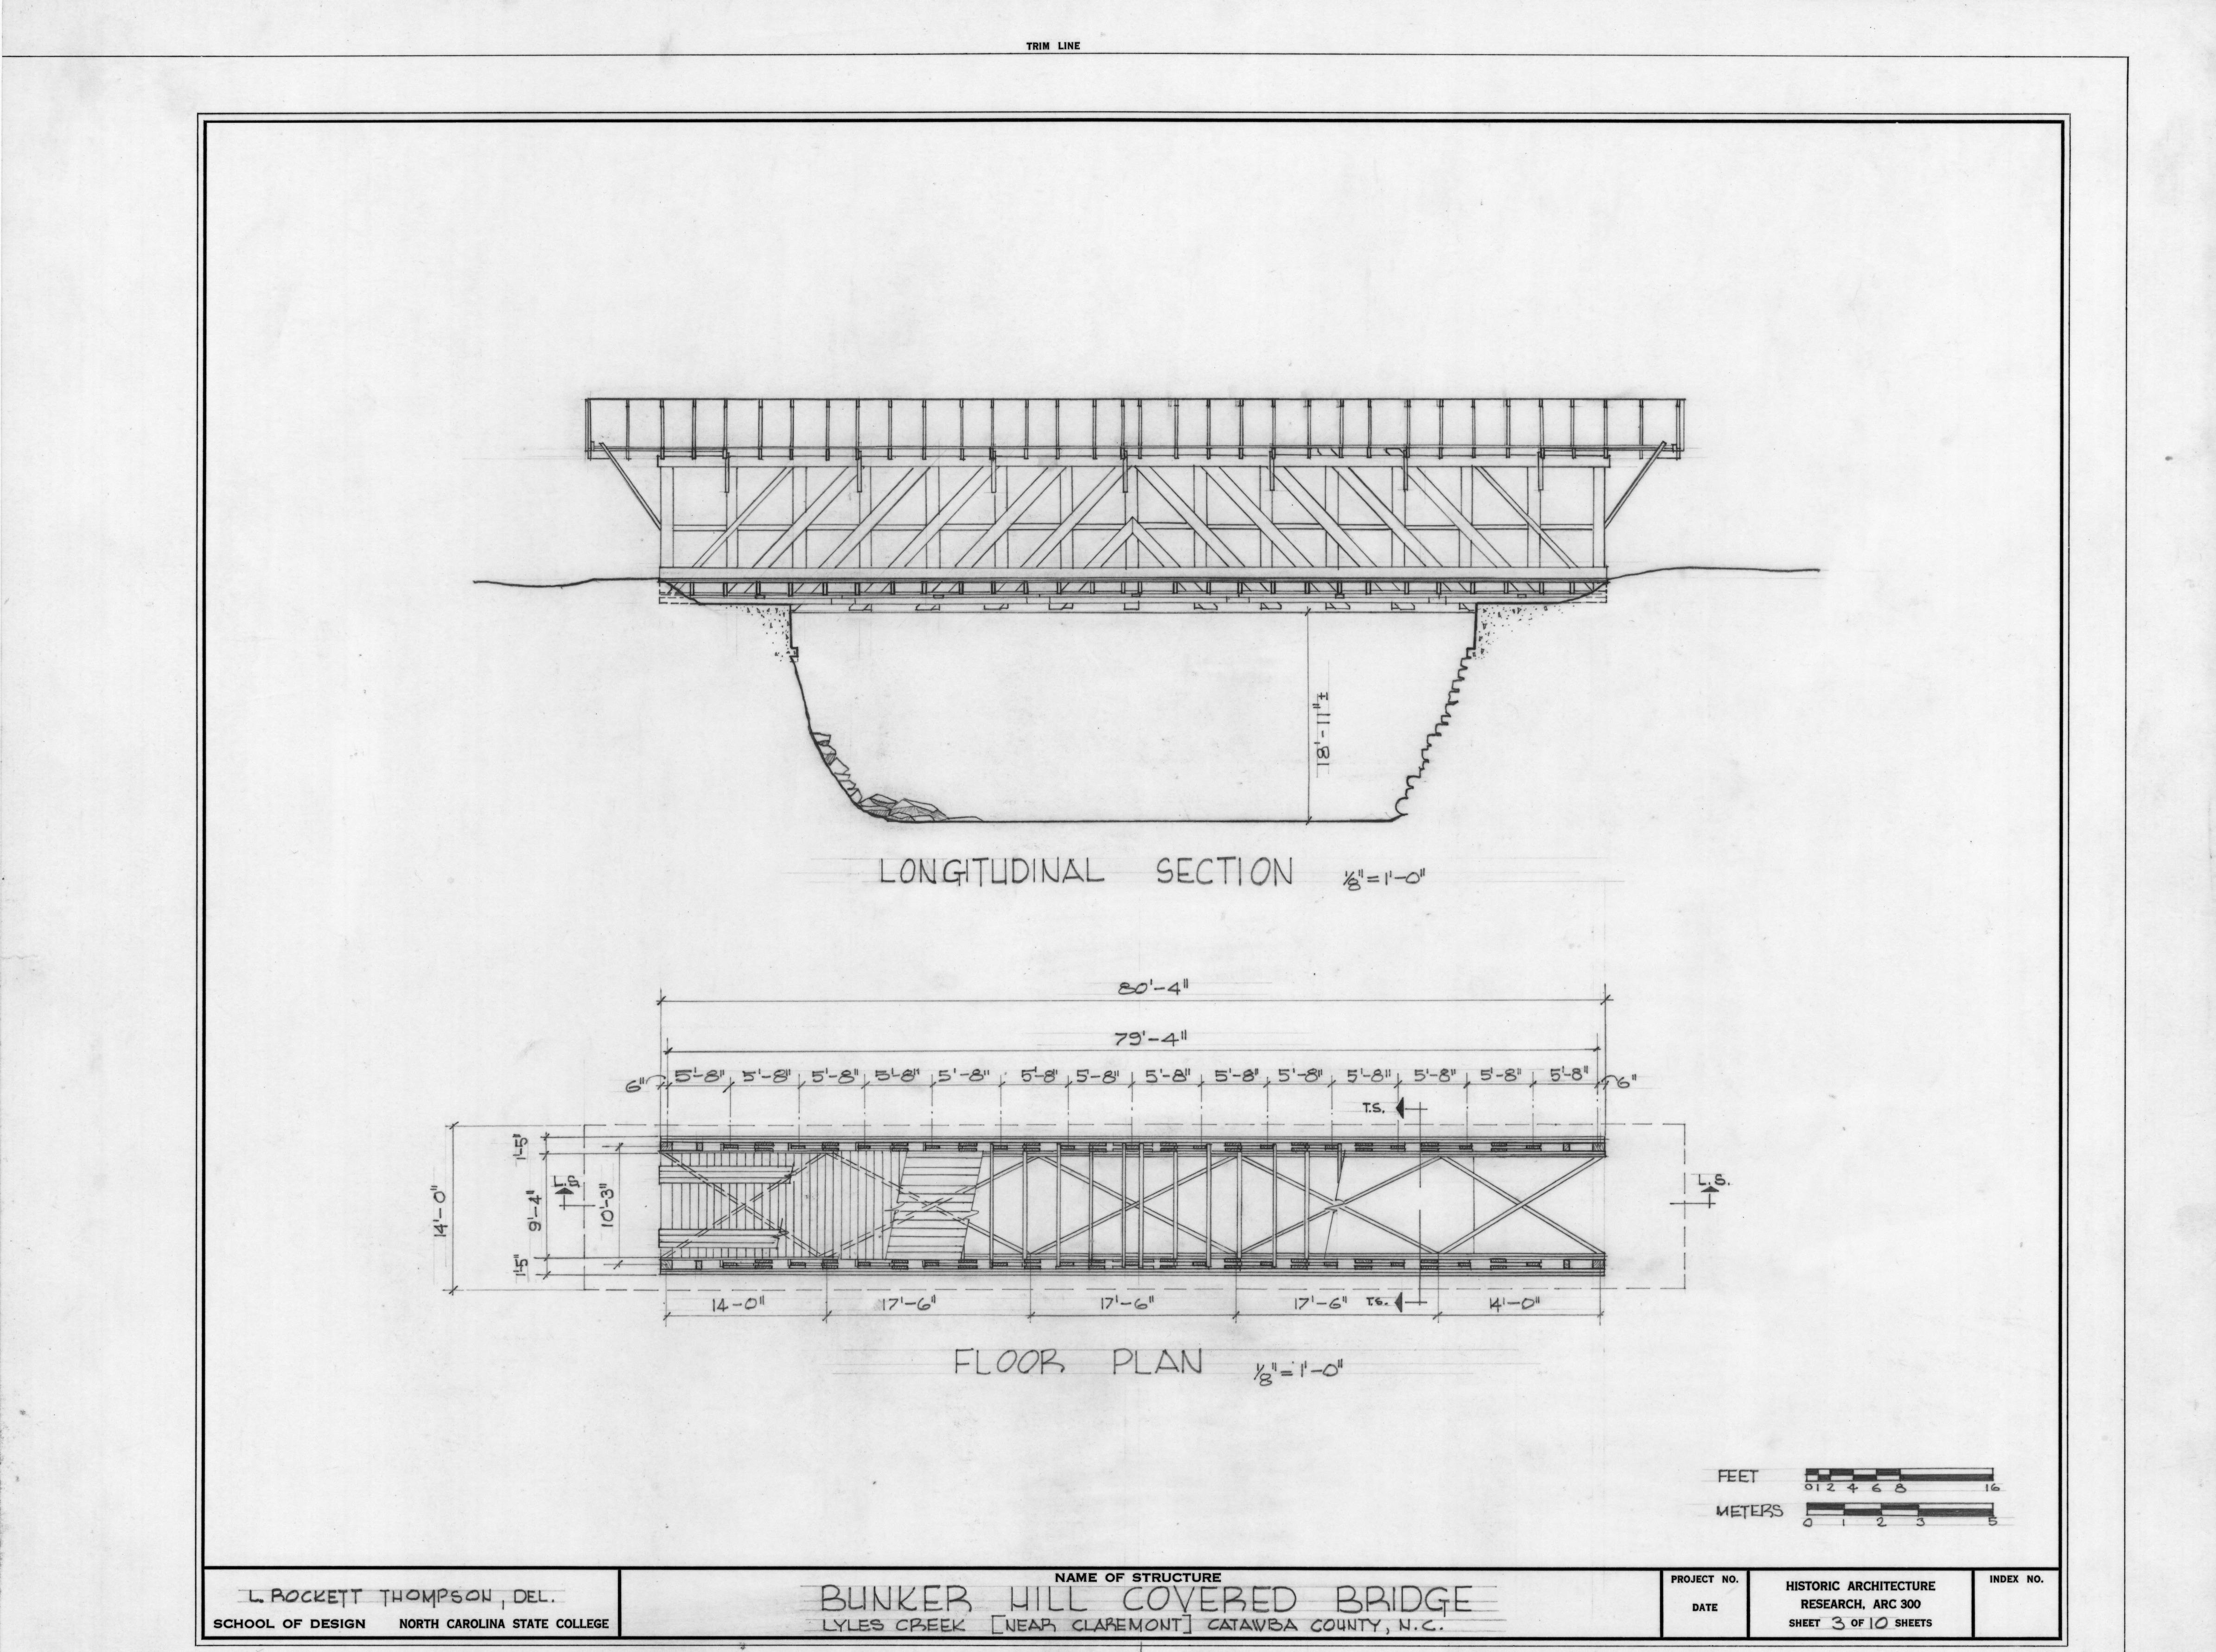 Longitudinal section and floor plan bunker hill covered for Covered bridge design plans